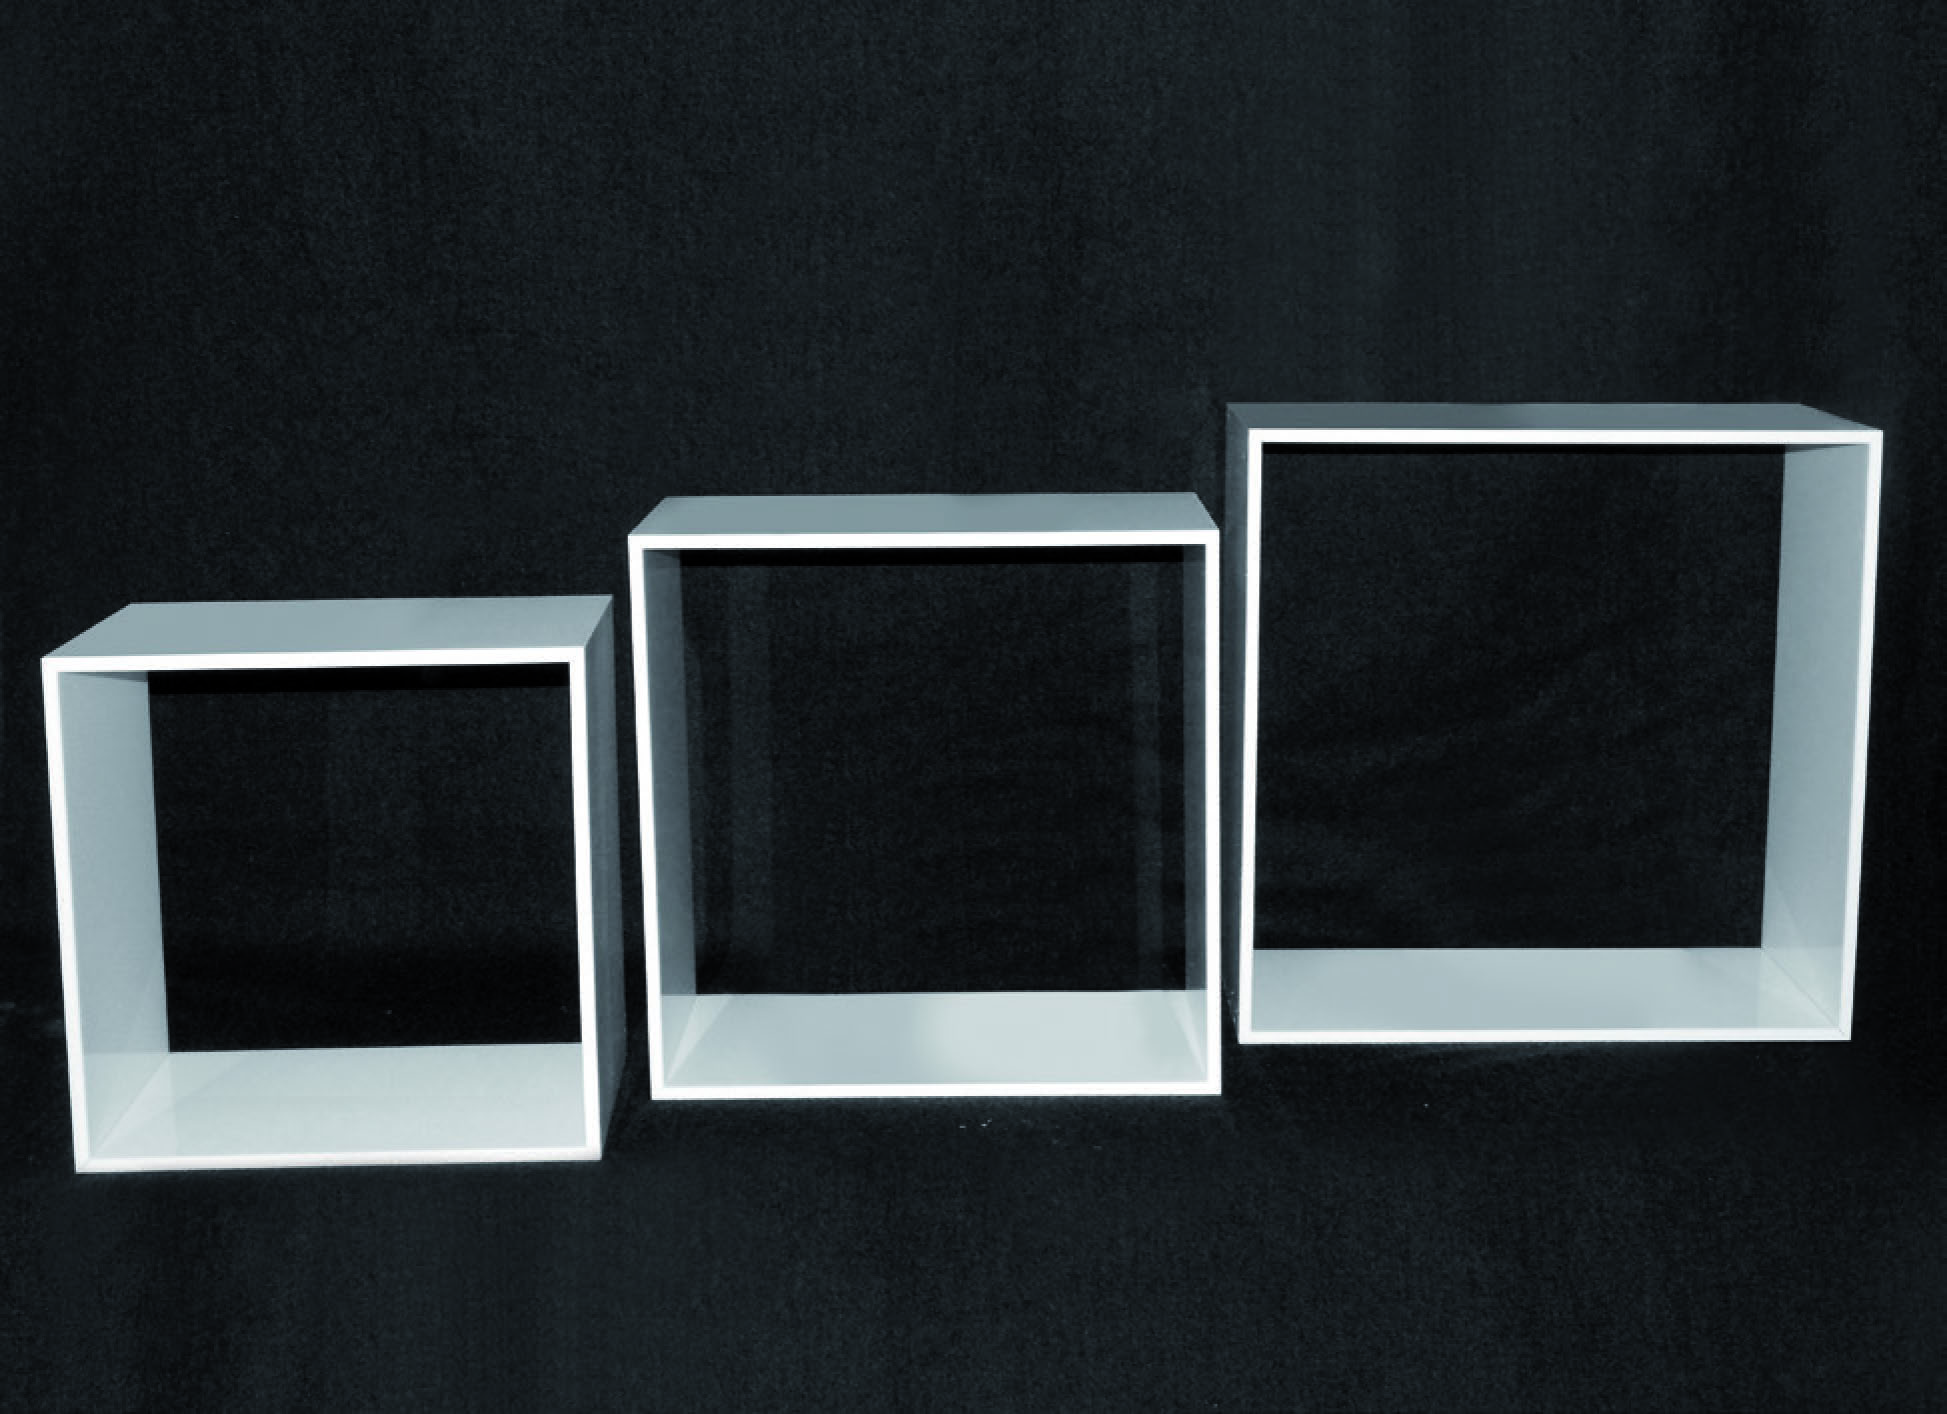 Set of 3 white plexiglass display cubes - thickness 8mm